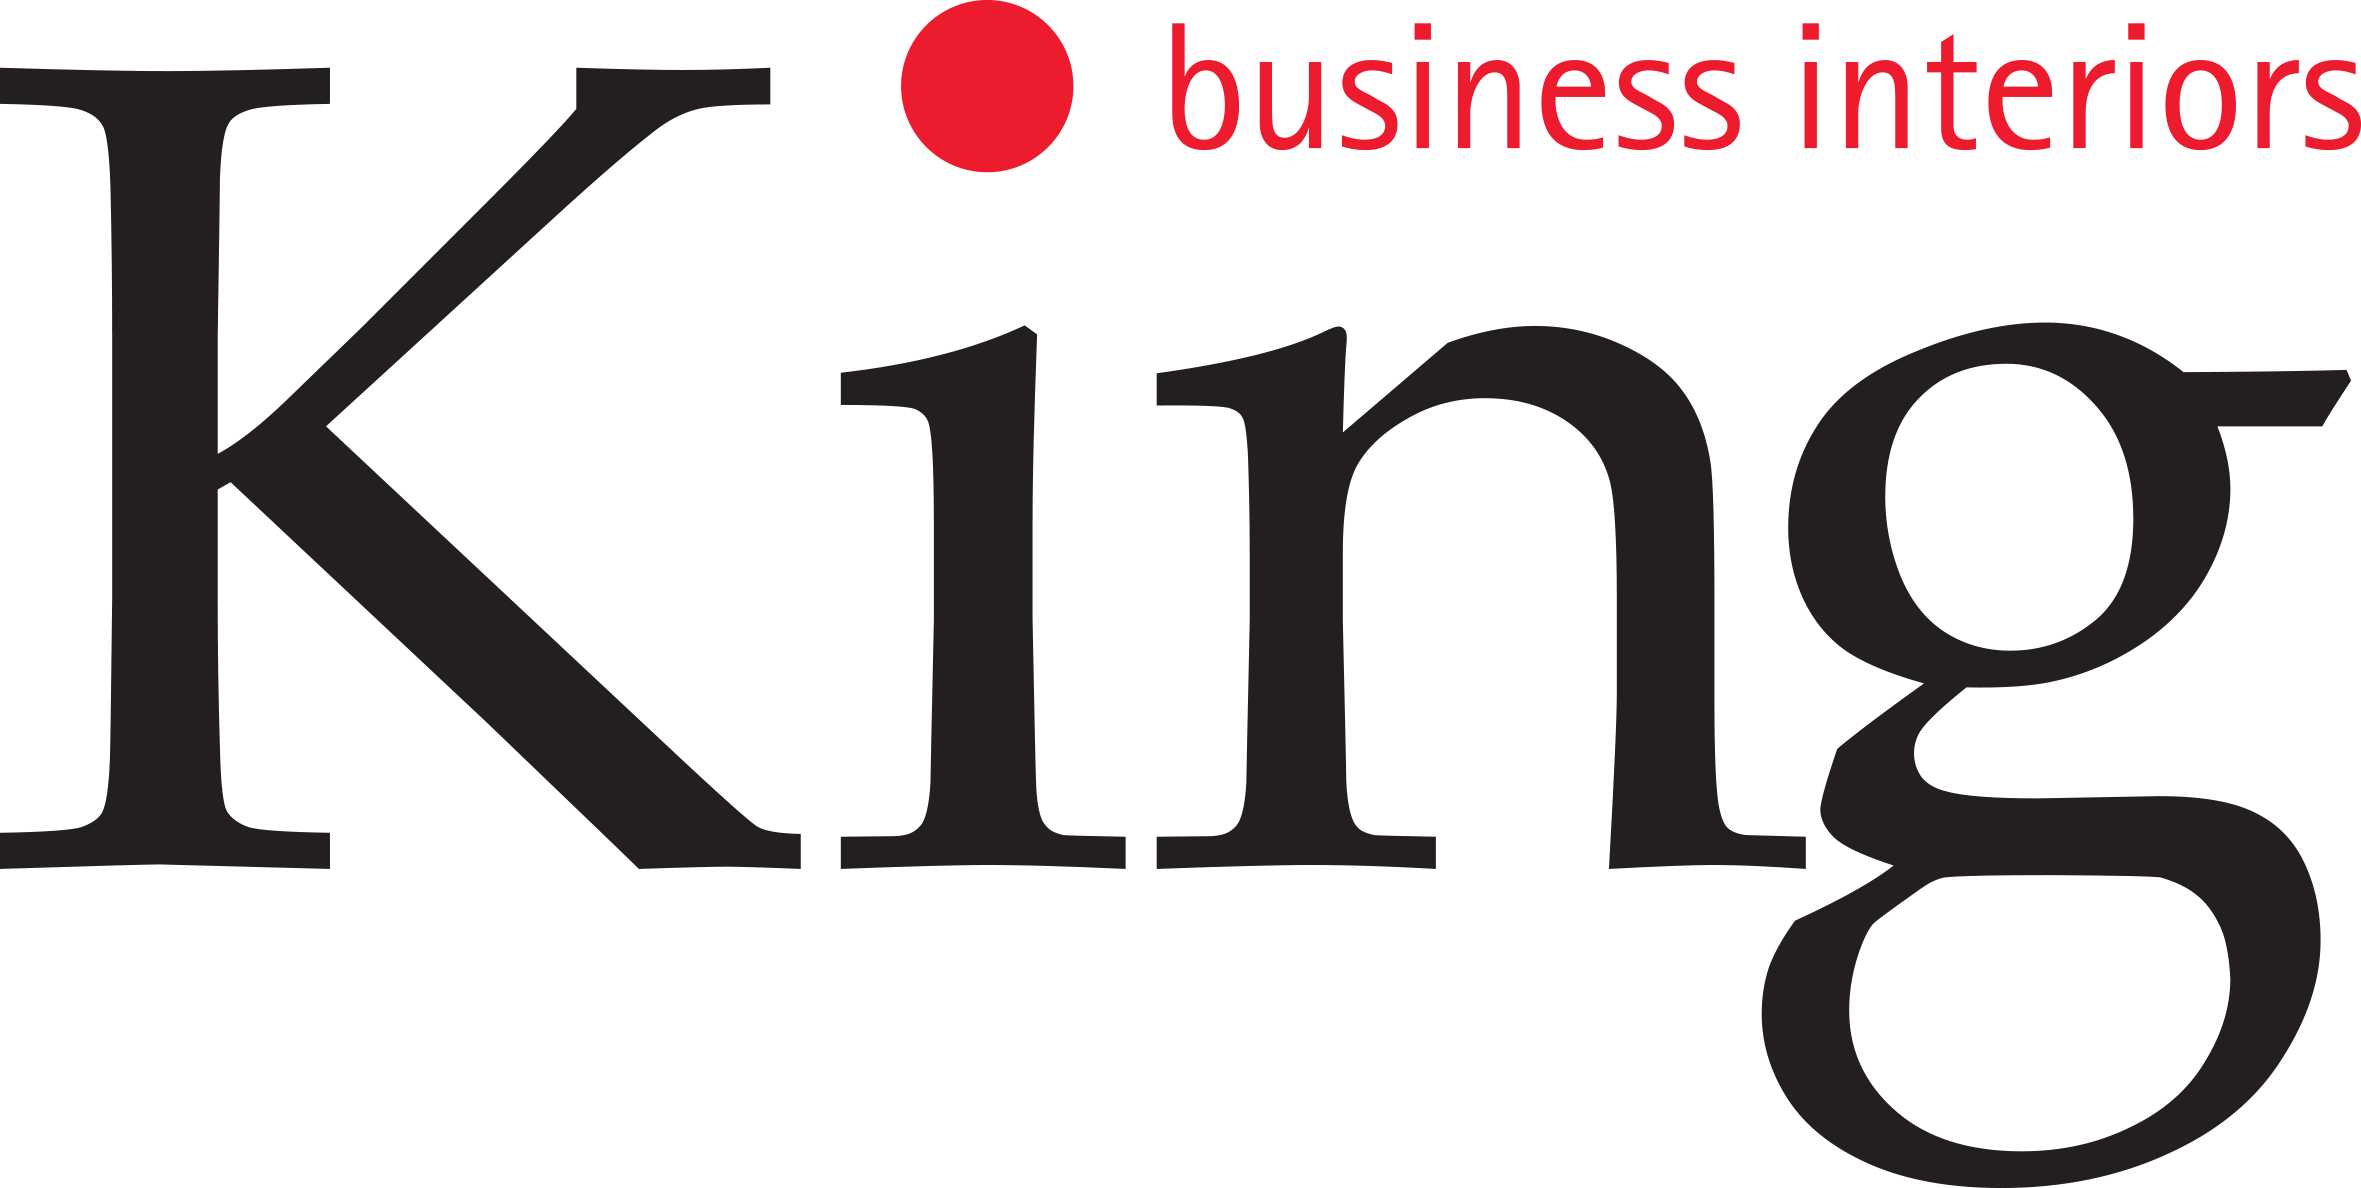 King Business Interiors logo